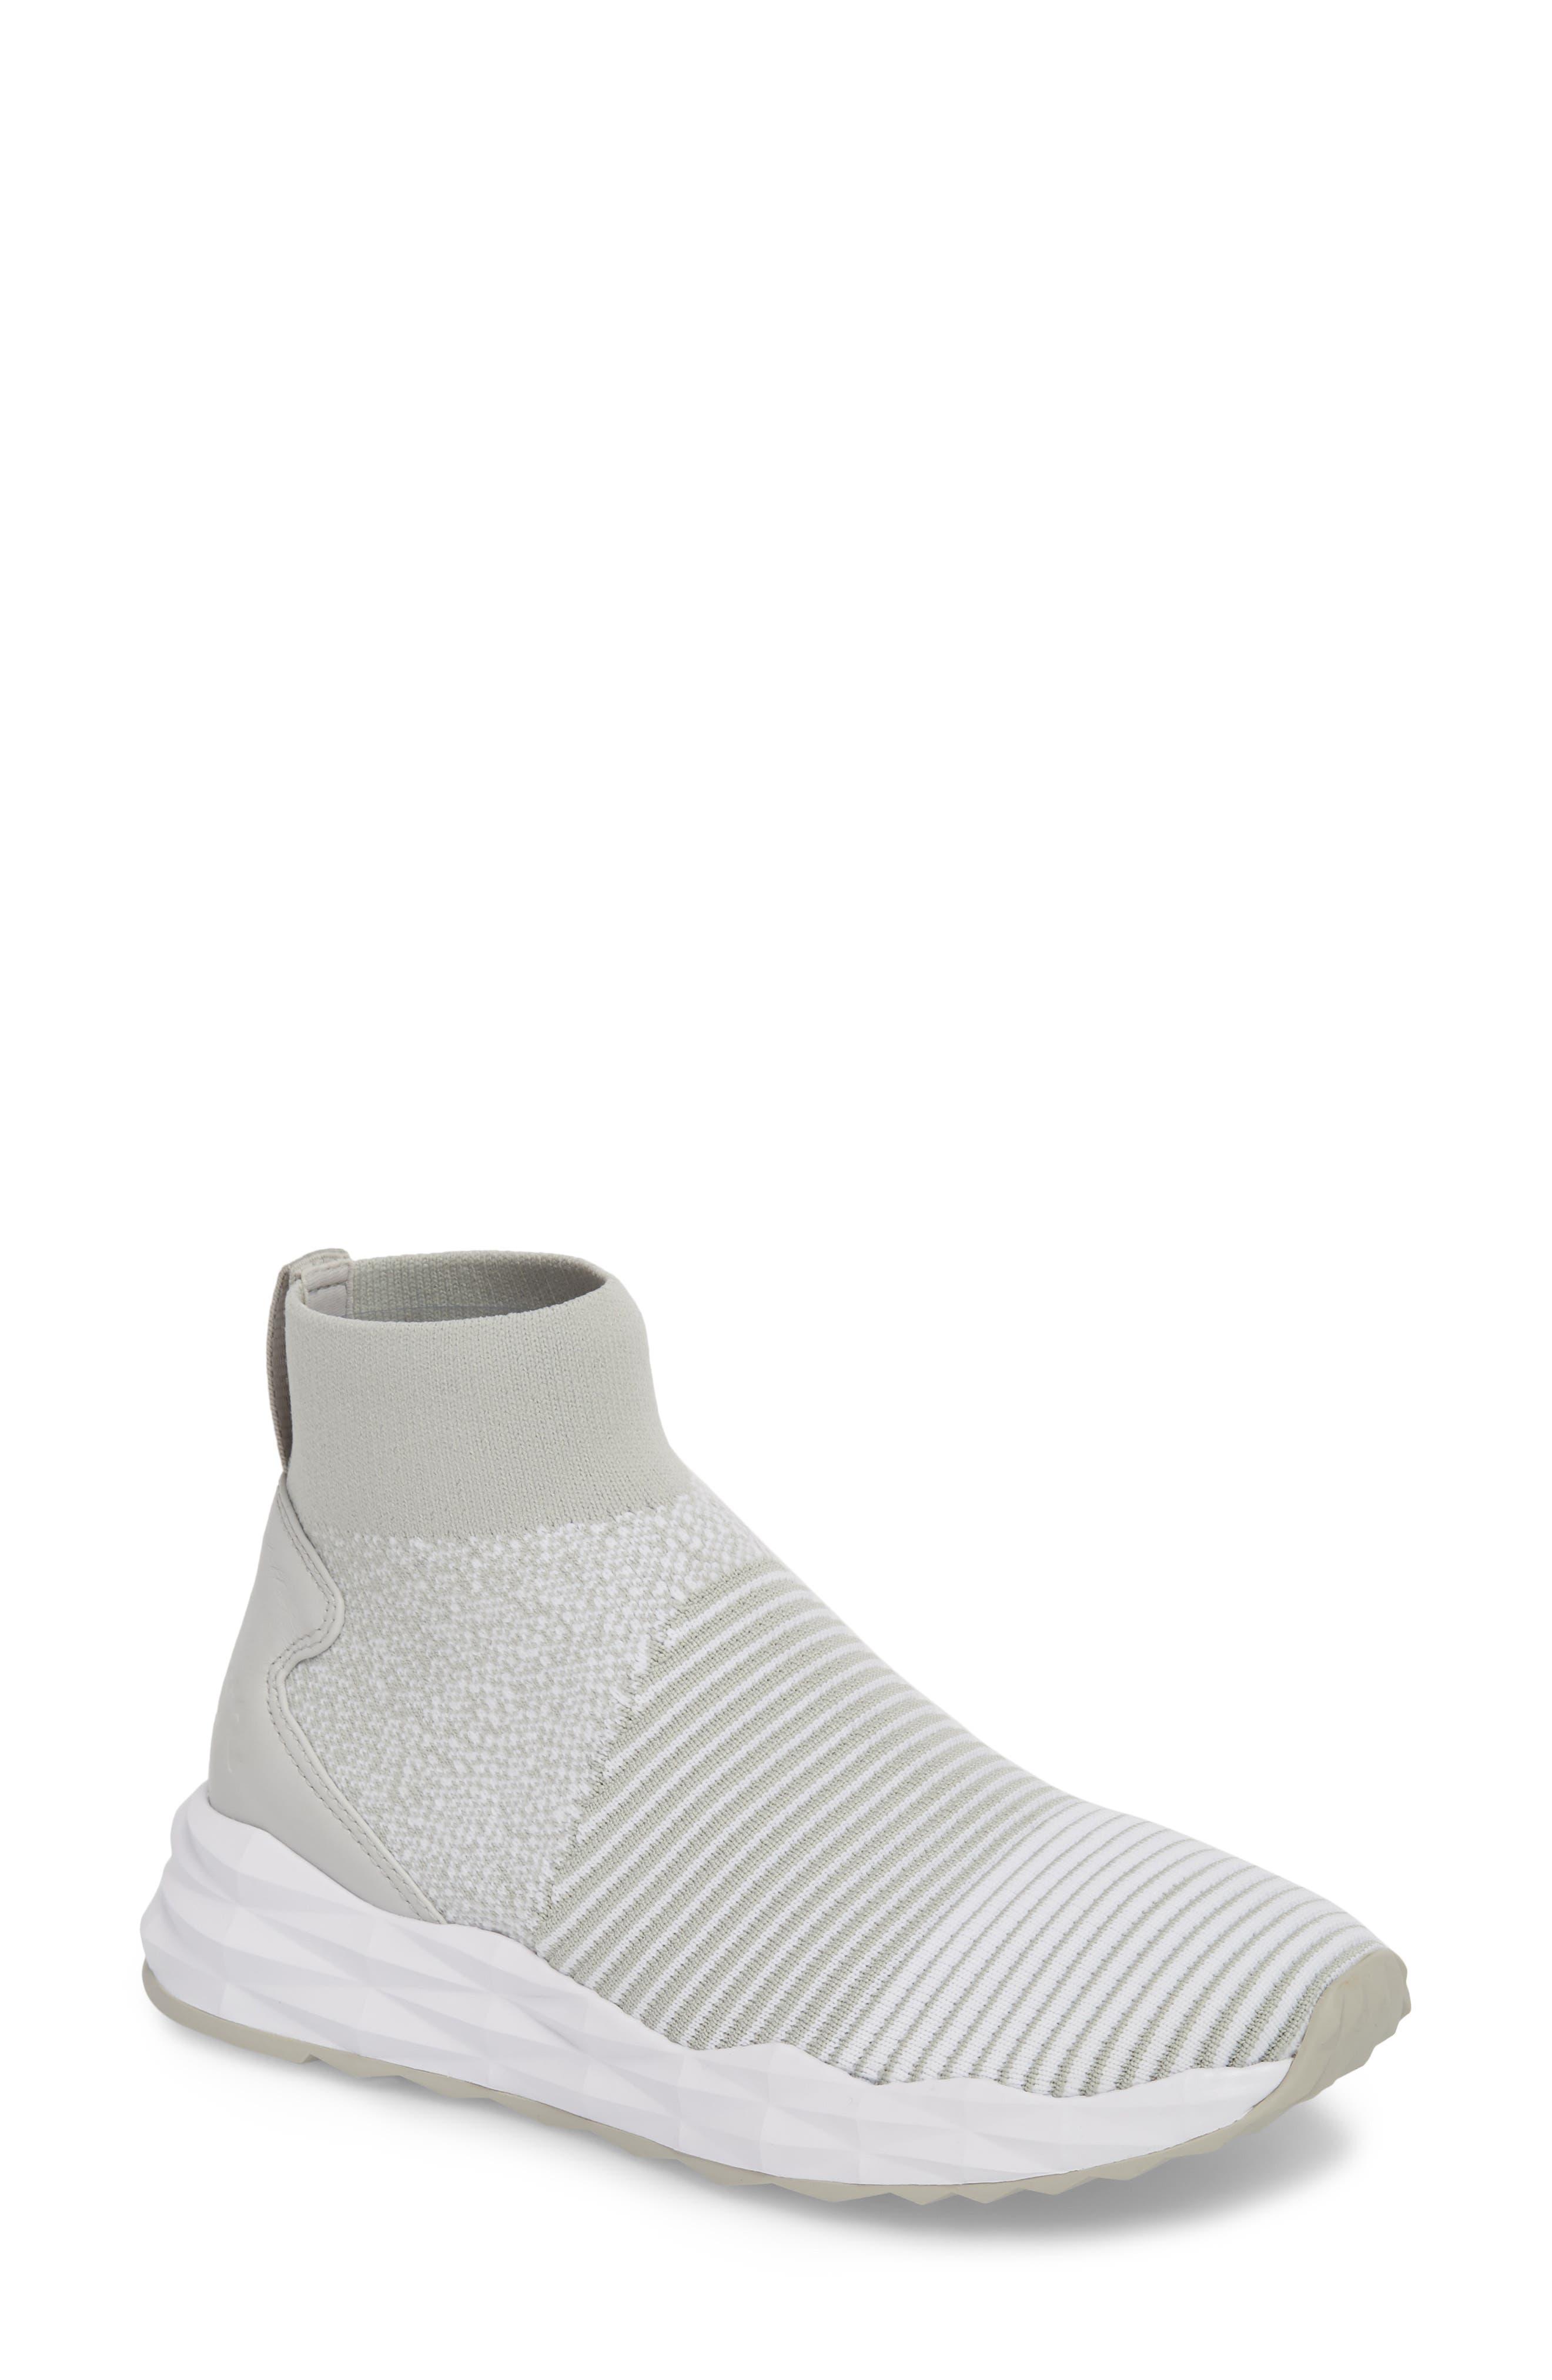 Spot High Top Sock Sneaker,                             Main thumbnail 1, color,                             040